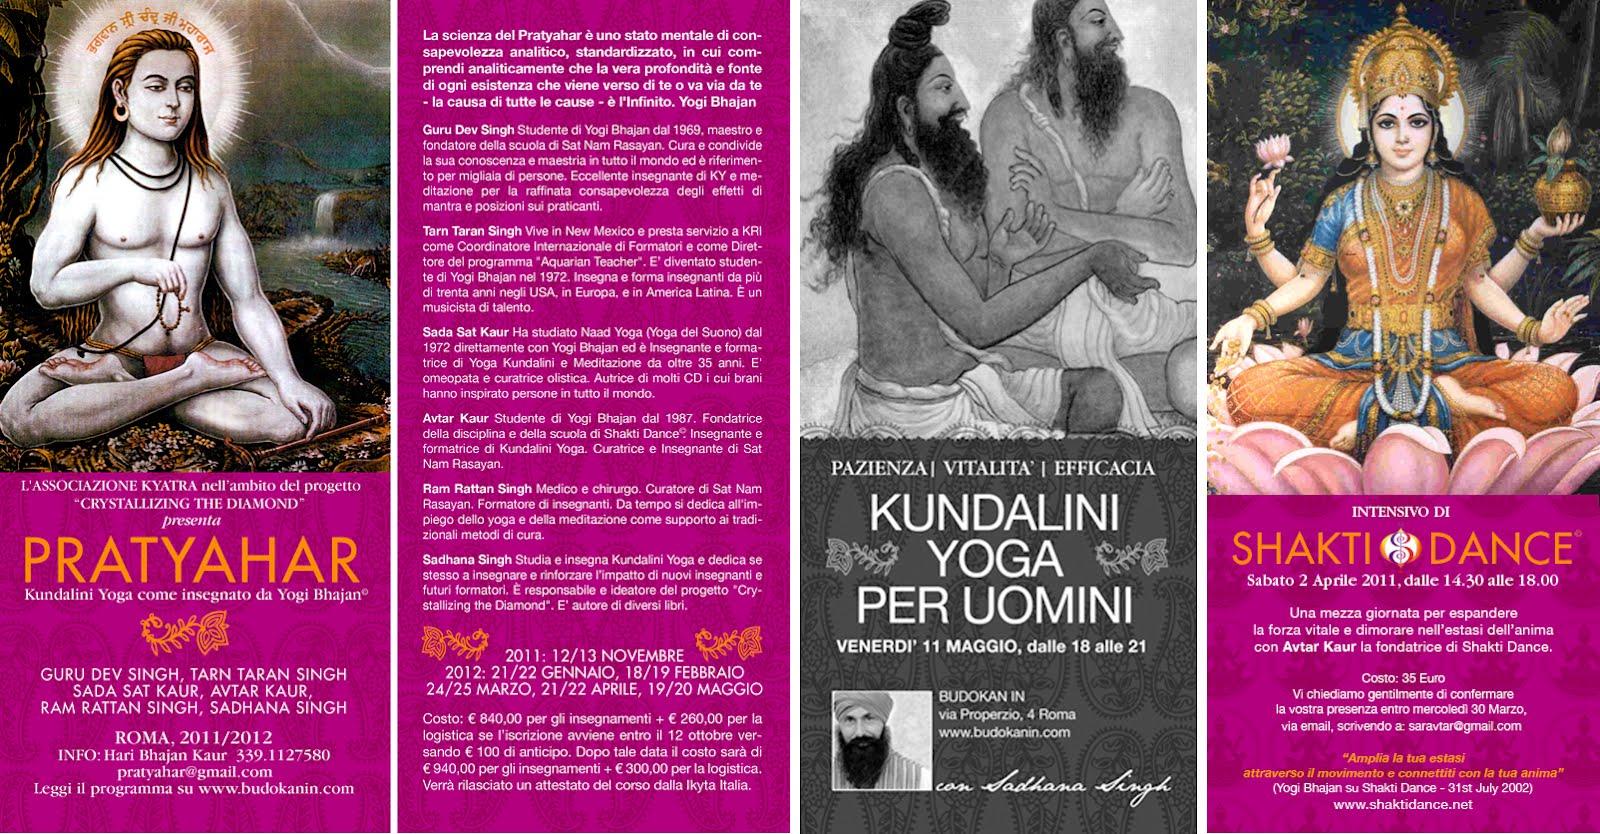 Ram Rattan Singh Roma.Cartoline Budokan In